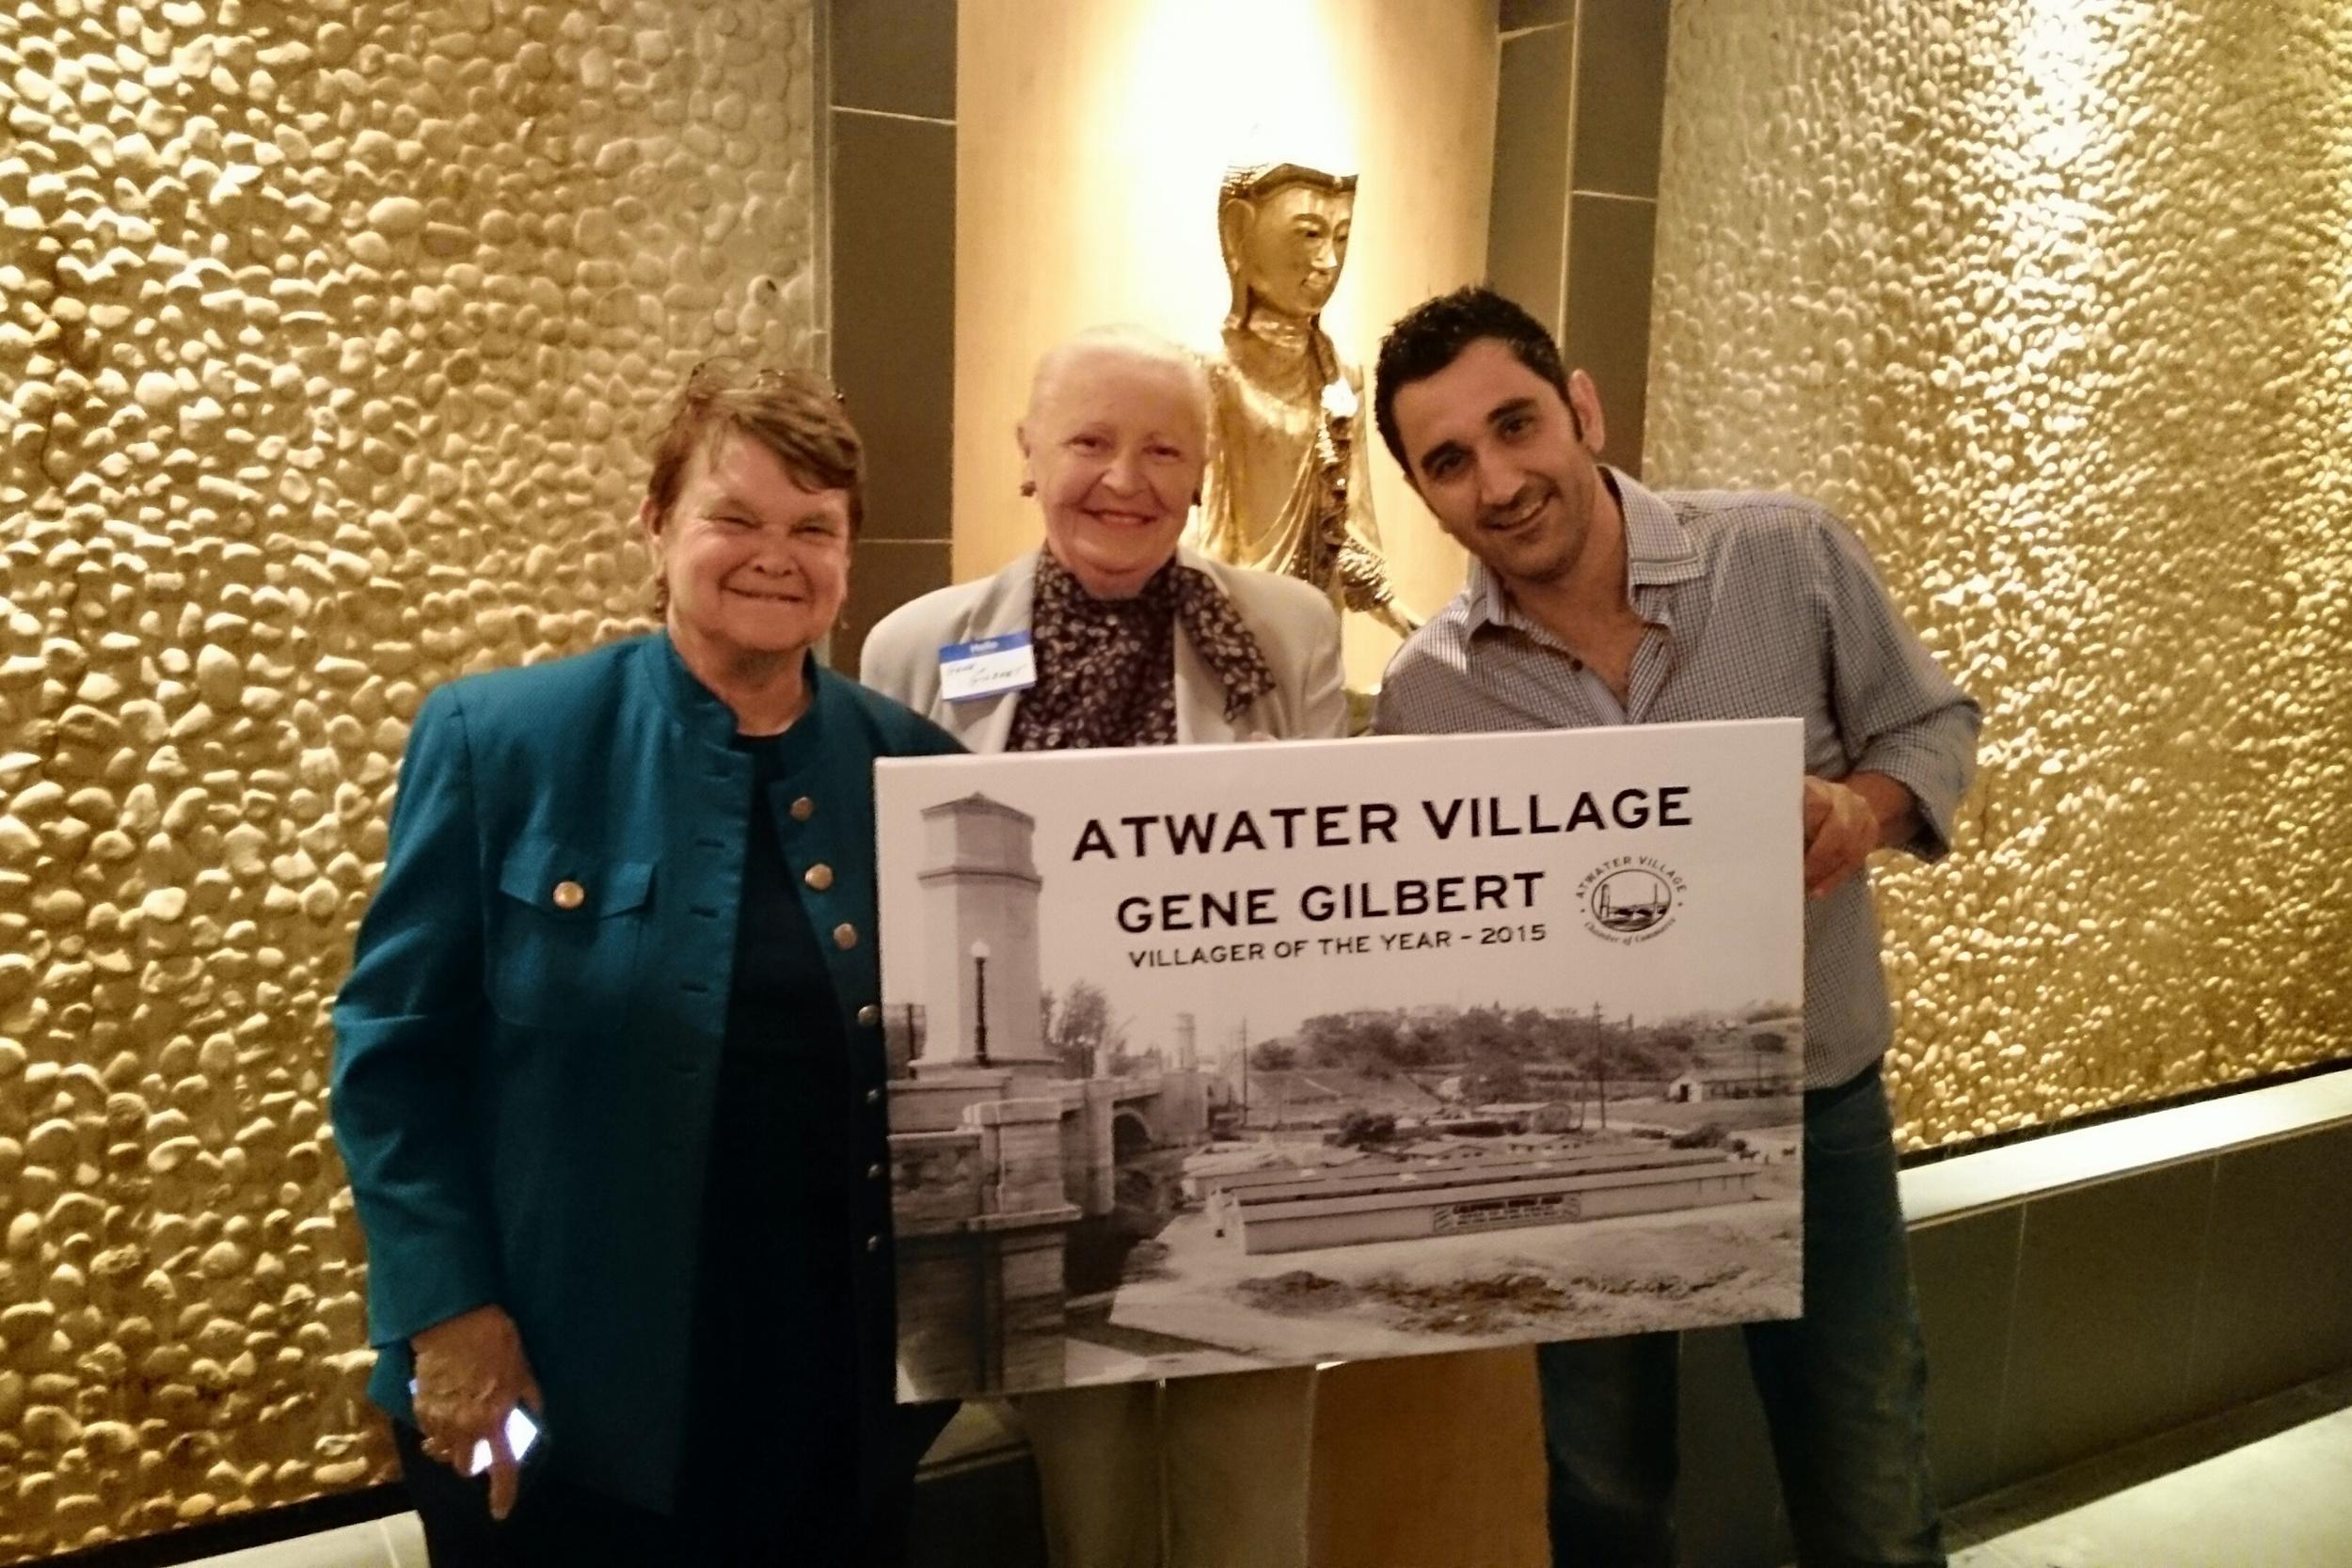 Supervisor Shelia Kuehl, Villager of the Year Honoree Gene Gilbert and Chamber President Andy Hasroun